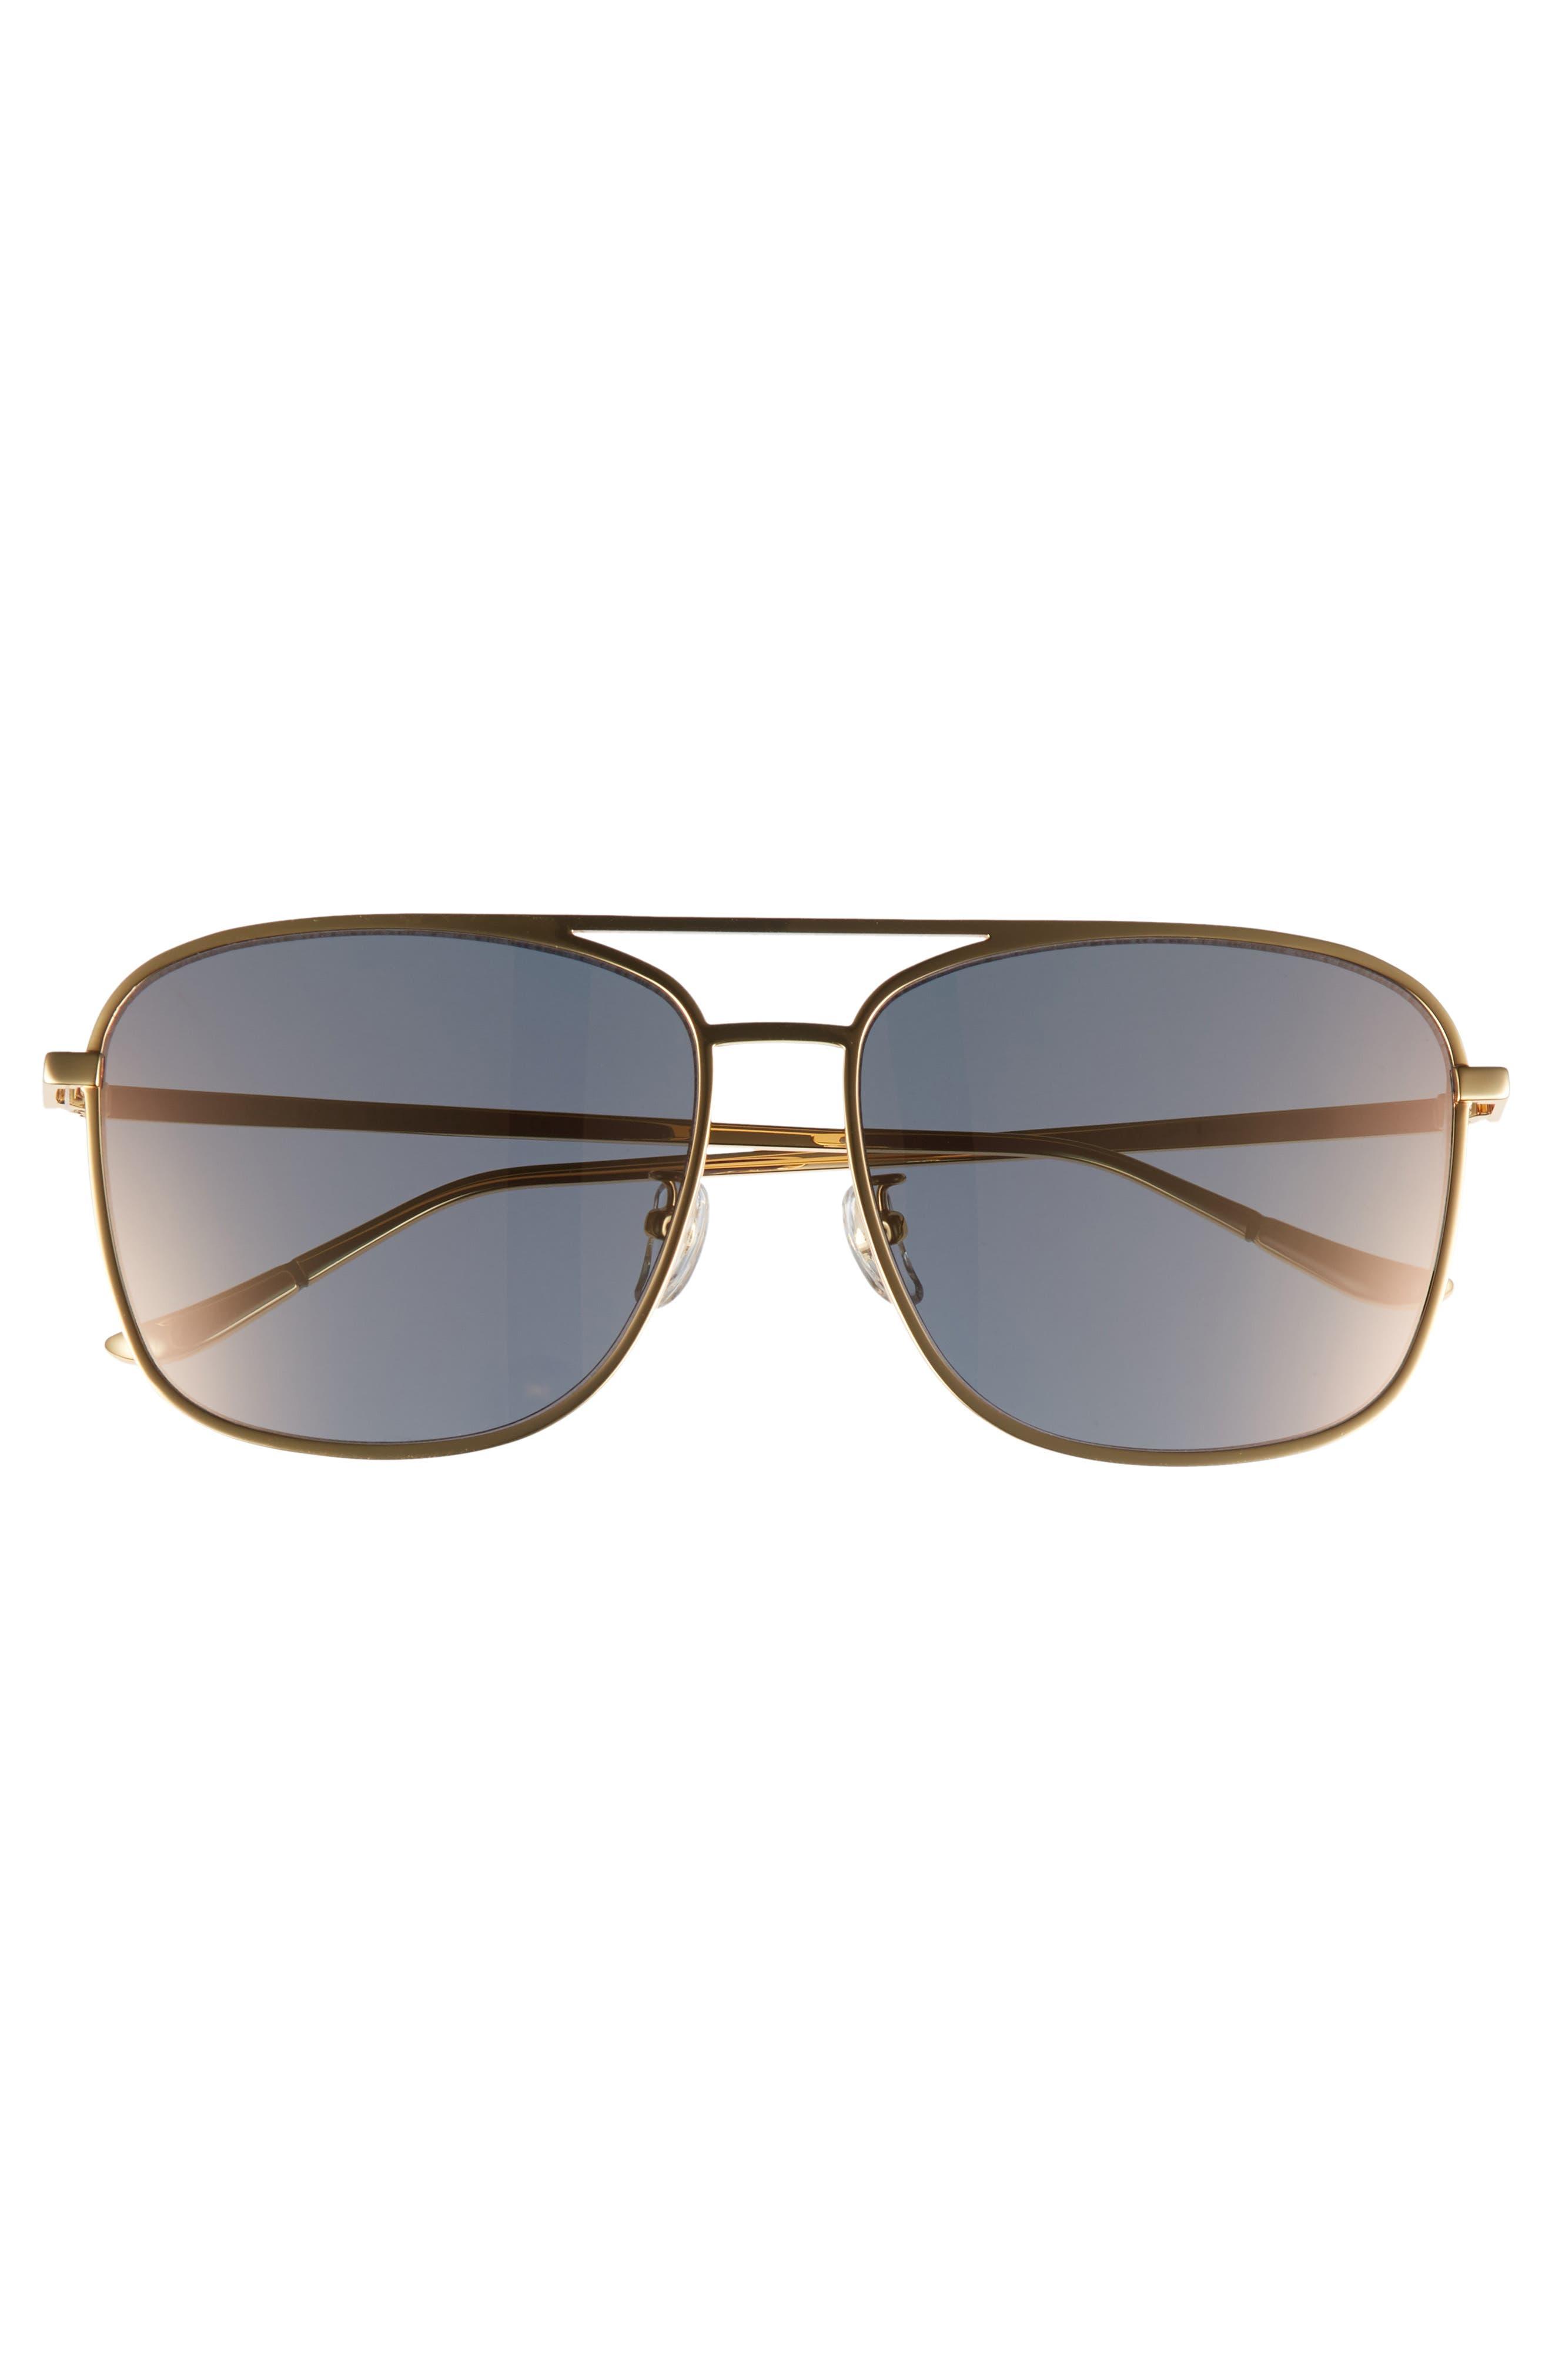 BLANC & ECLARE Geneva 61mm Large Polarized Metal Aviator Sunglasses,                             Alternate thumbnail 3, color,                             710